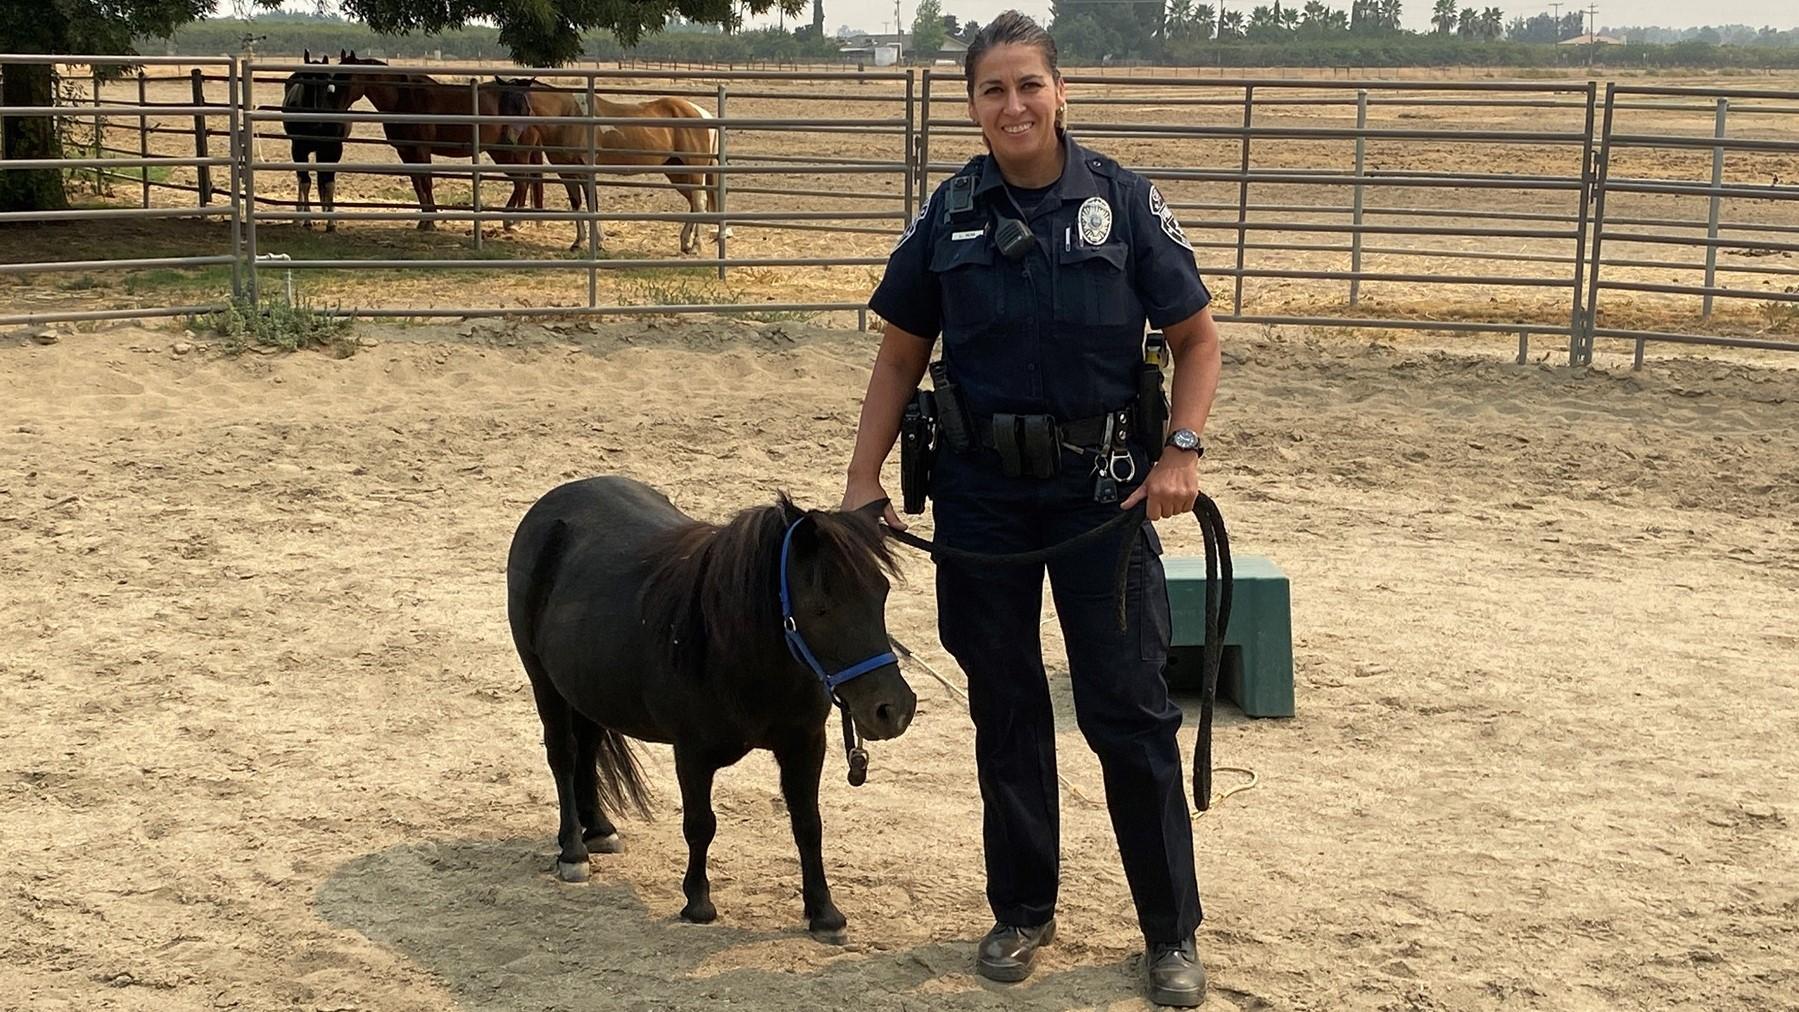 Mini horse has big dreams with Madera Police